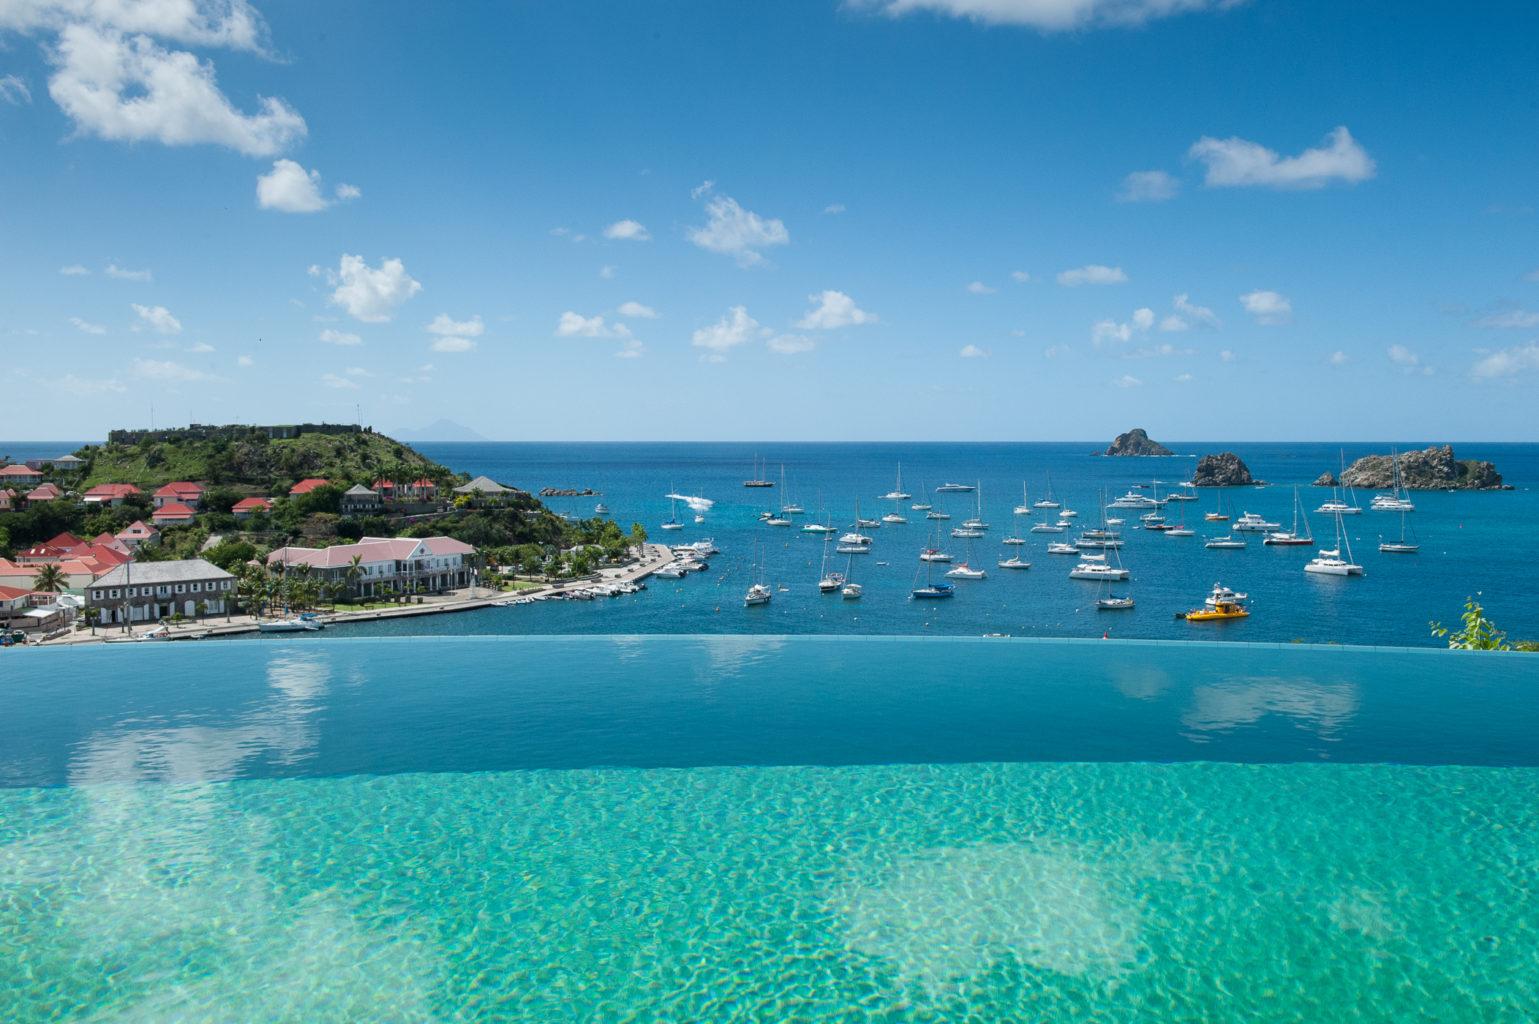 Villa Lam - Modern Villa for Rent with Fitness Equipment St Barth Gustavia - Ocean view